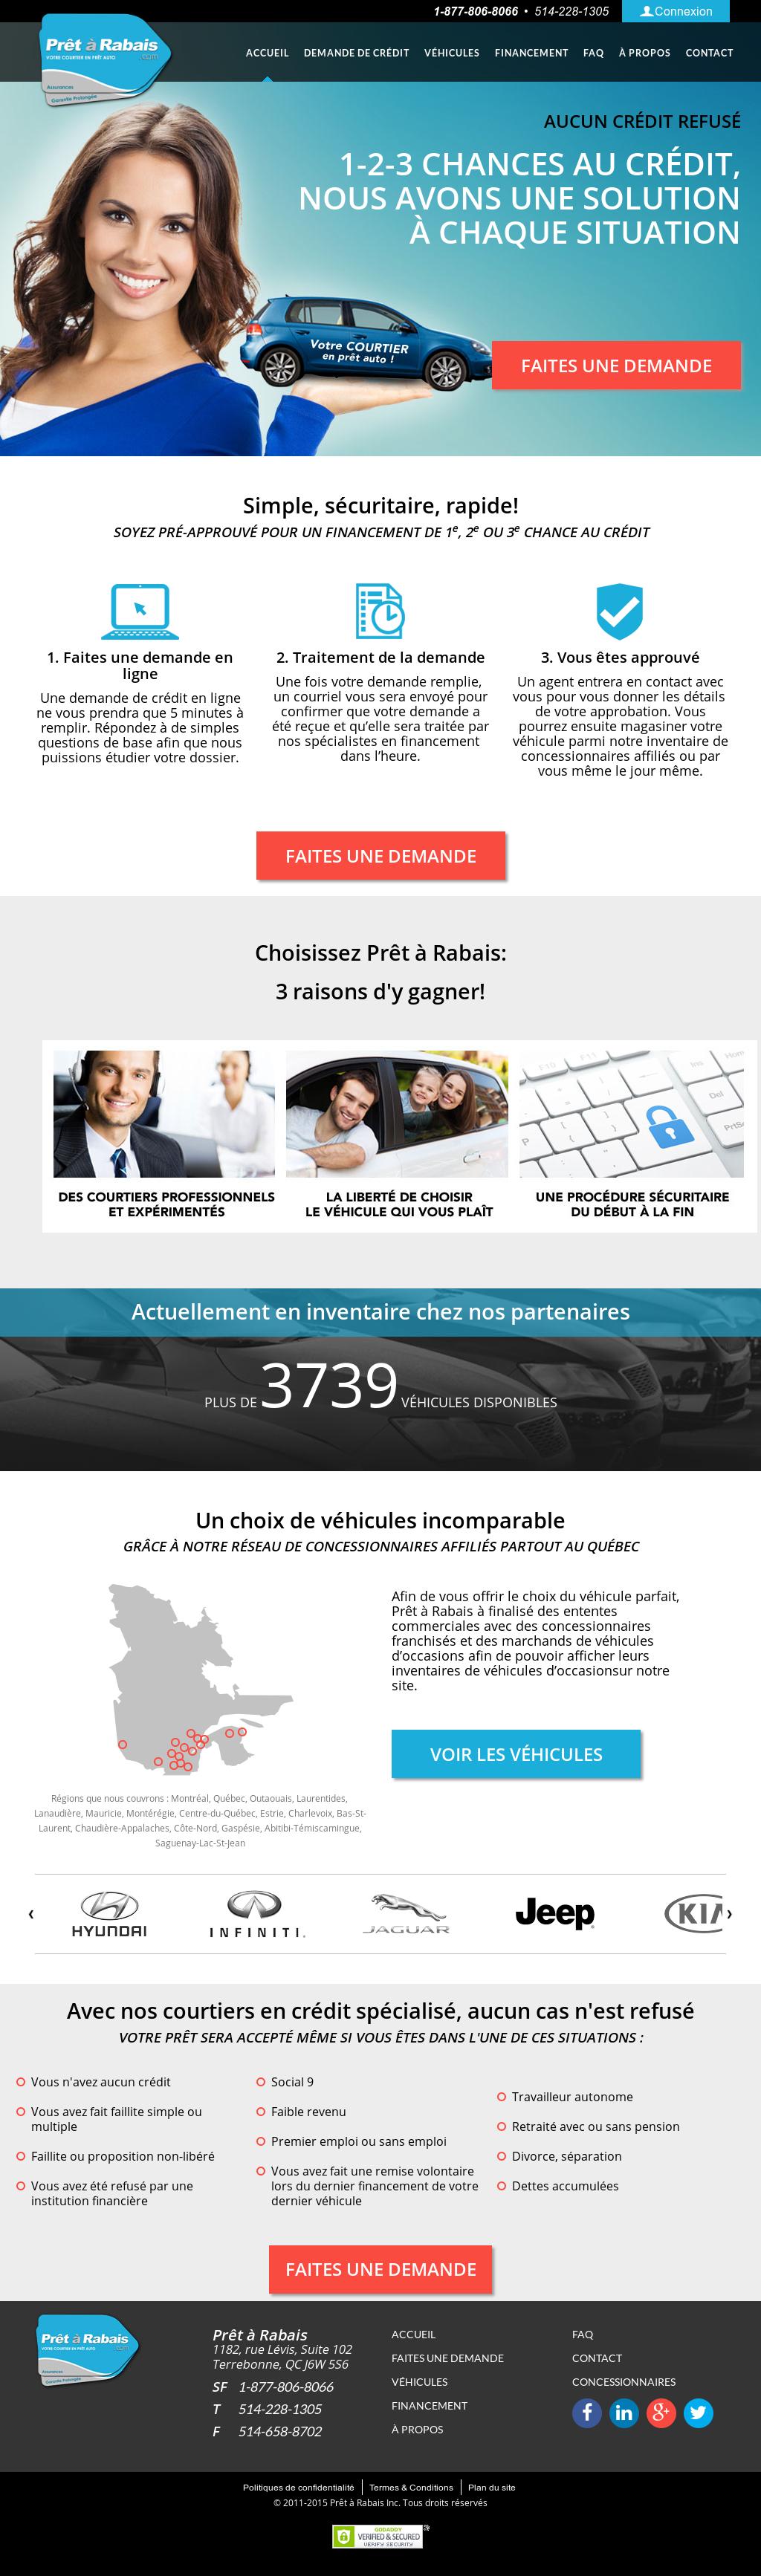 Pret A Rabais >> Pret A Rabais Competitors Revenue And Employees Owler Company Profile